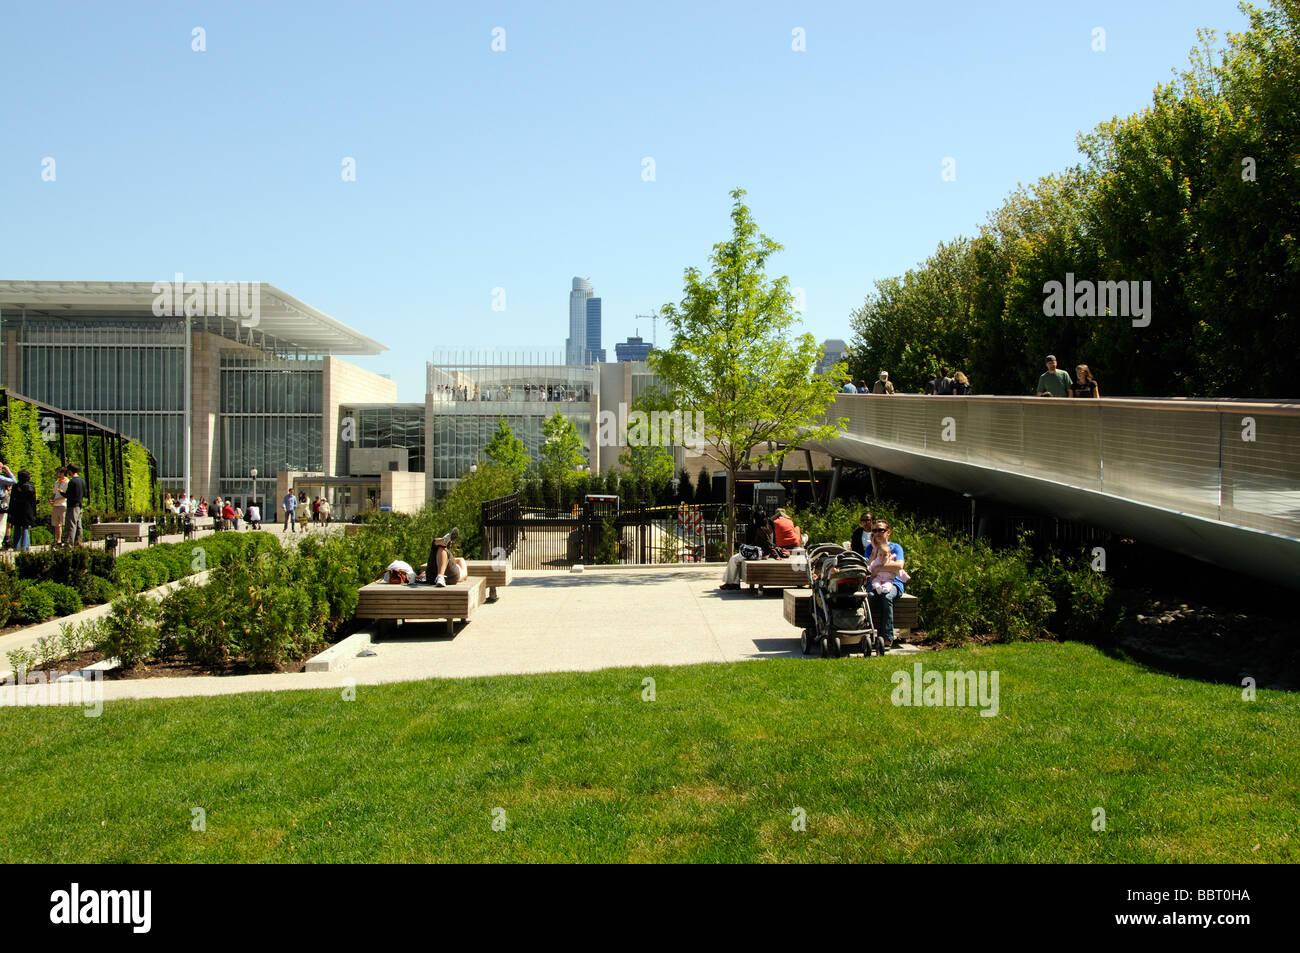 The Nichols Bridgeway access to The Art Institute of Chicago Illinois USA - Stock Image